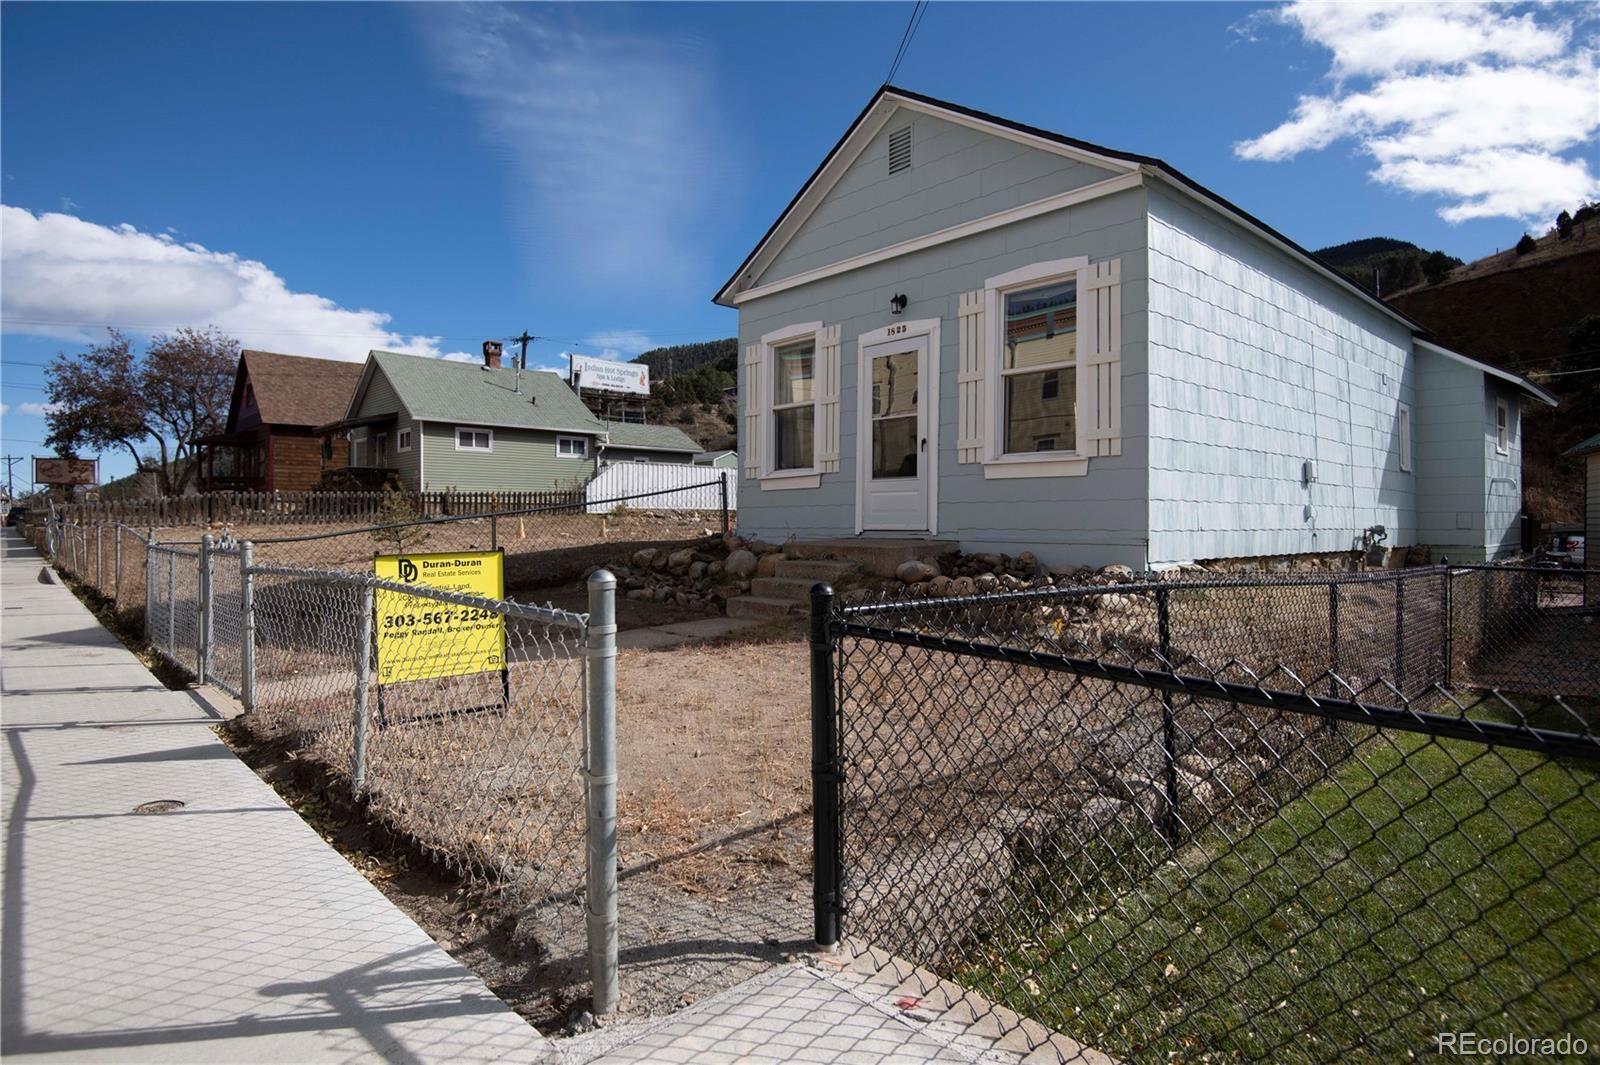 1825 Miner Street, Idaho Springs, CO 80452 - #: 4828644